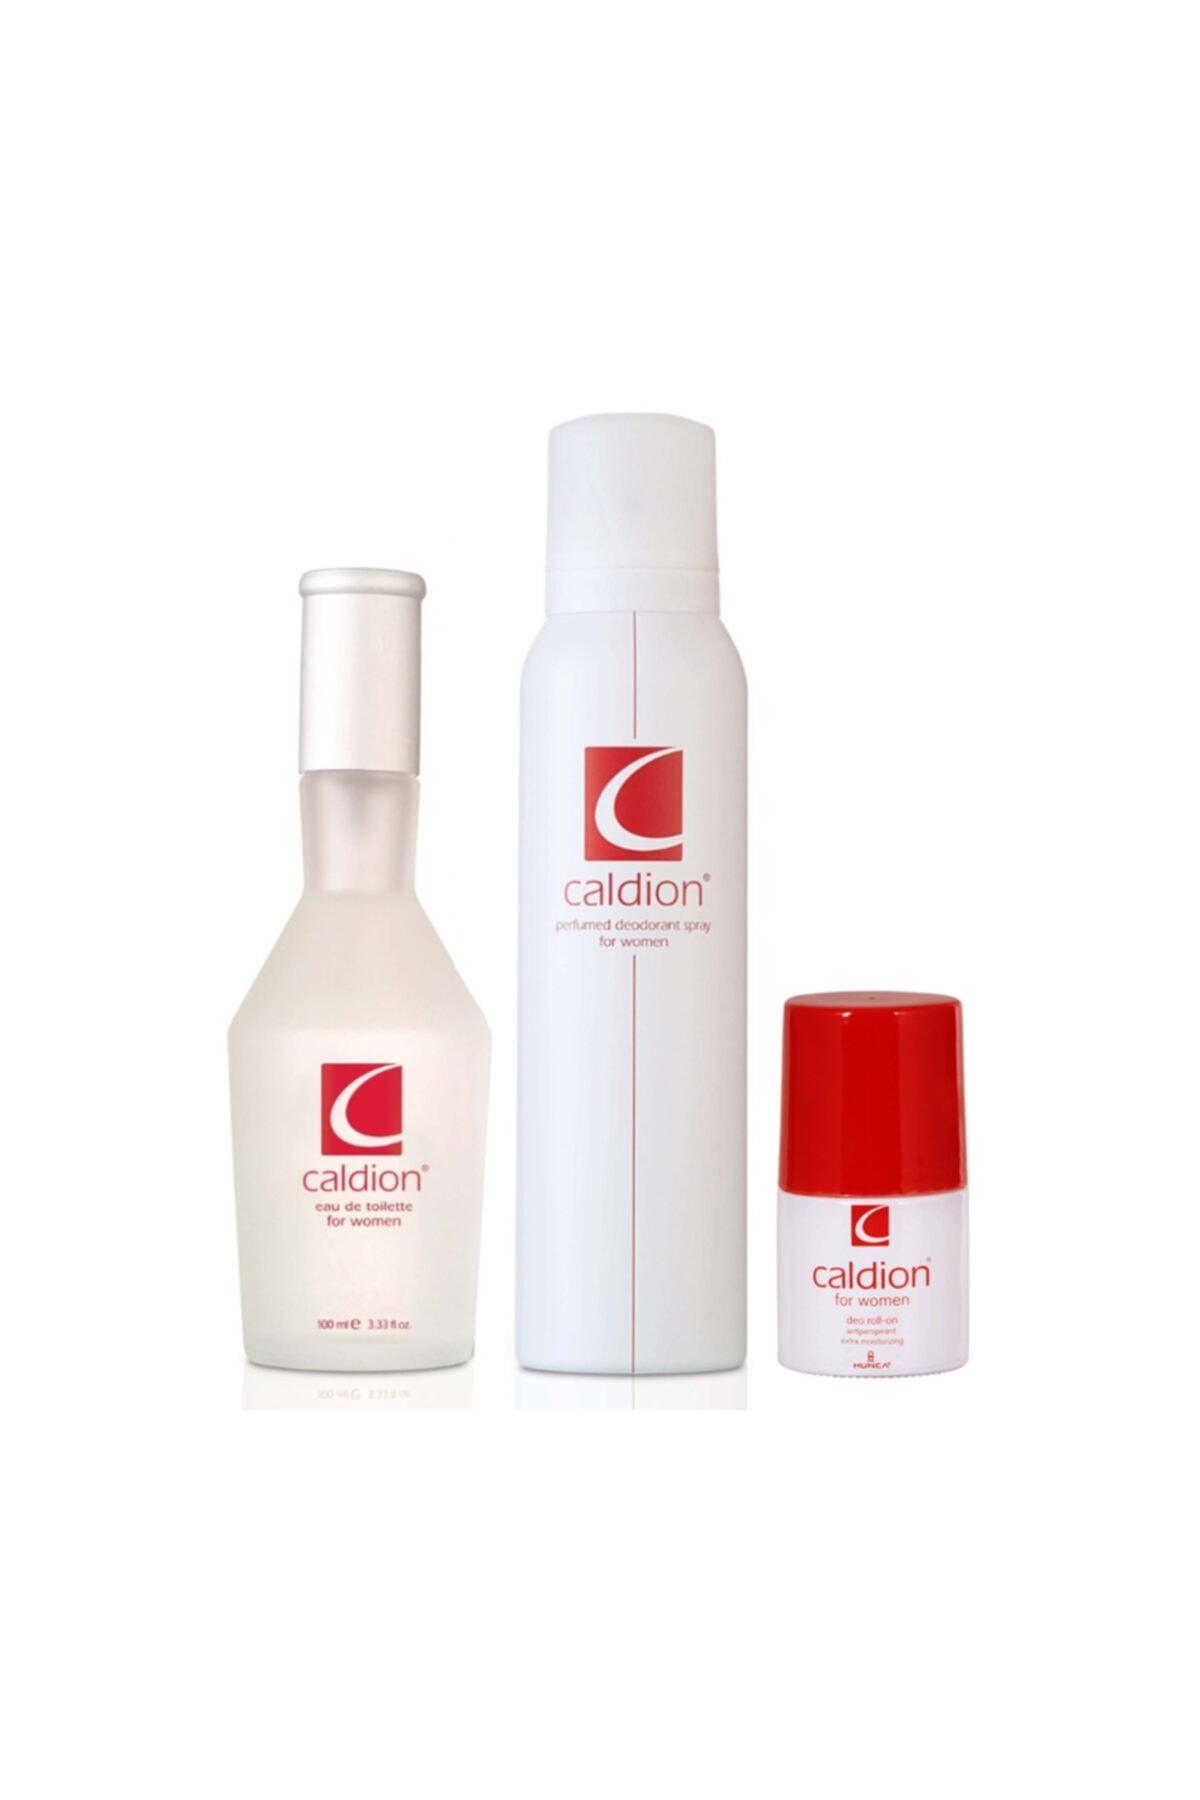 Caldion Edt 100 ml + 100 ml Vücut Spreyi + 50 ml Roll-on Kadın Parfüm Seti 86909735072802 1